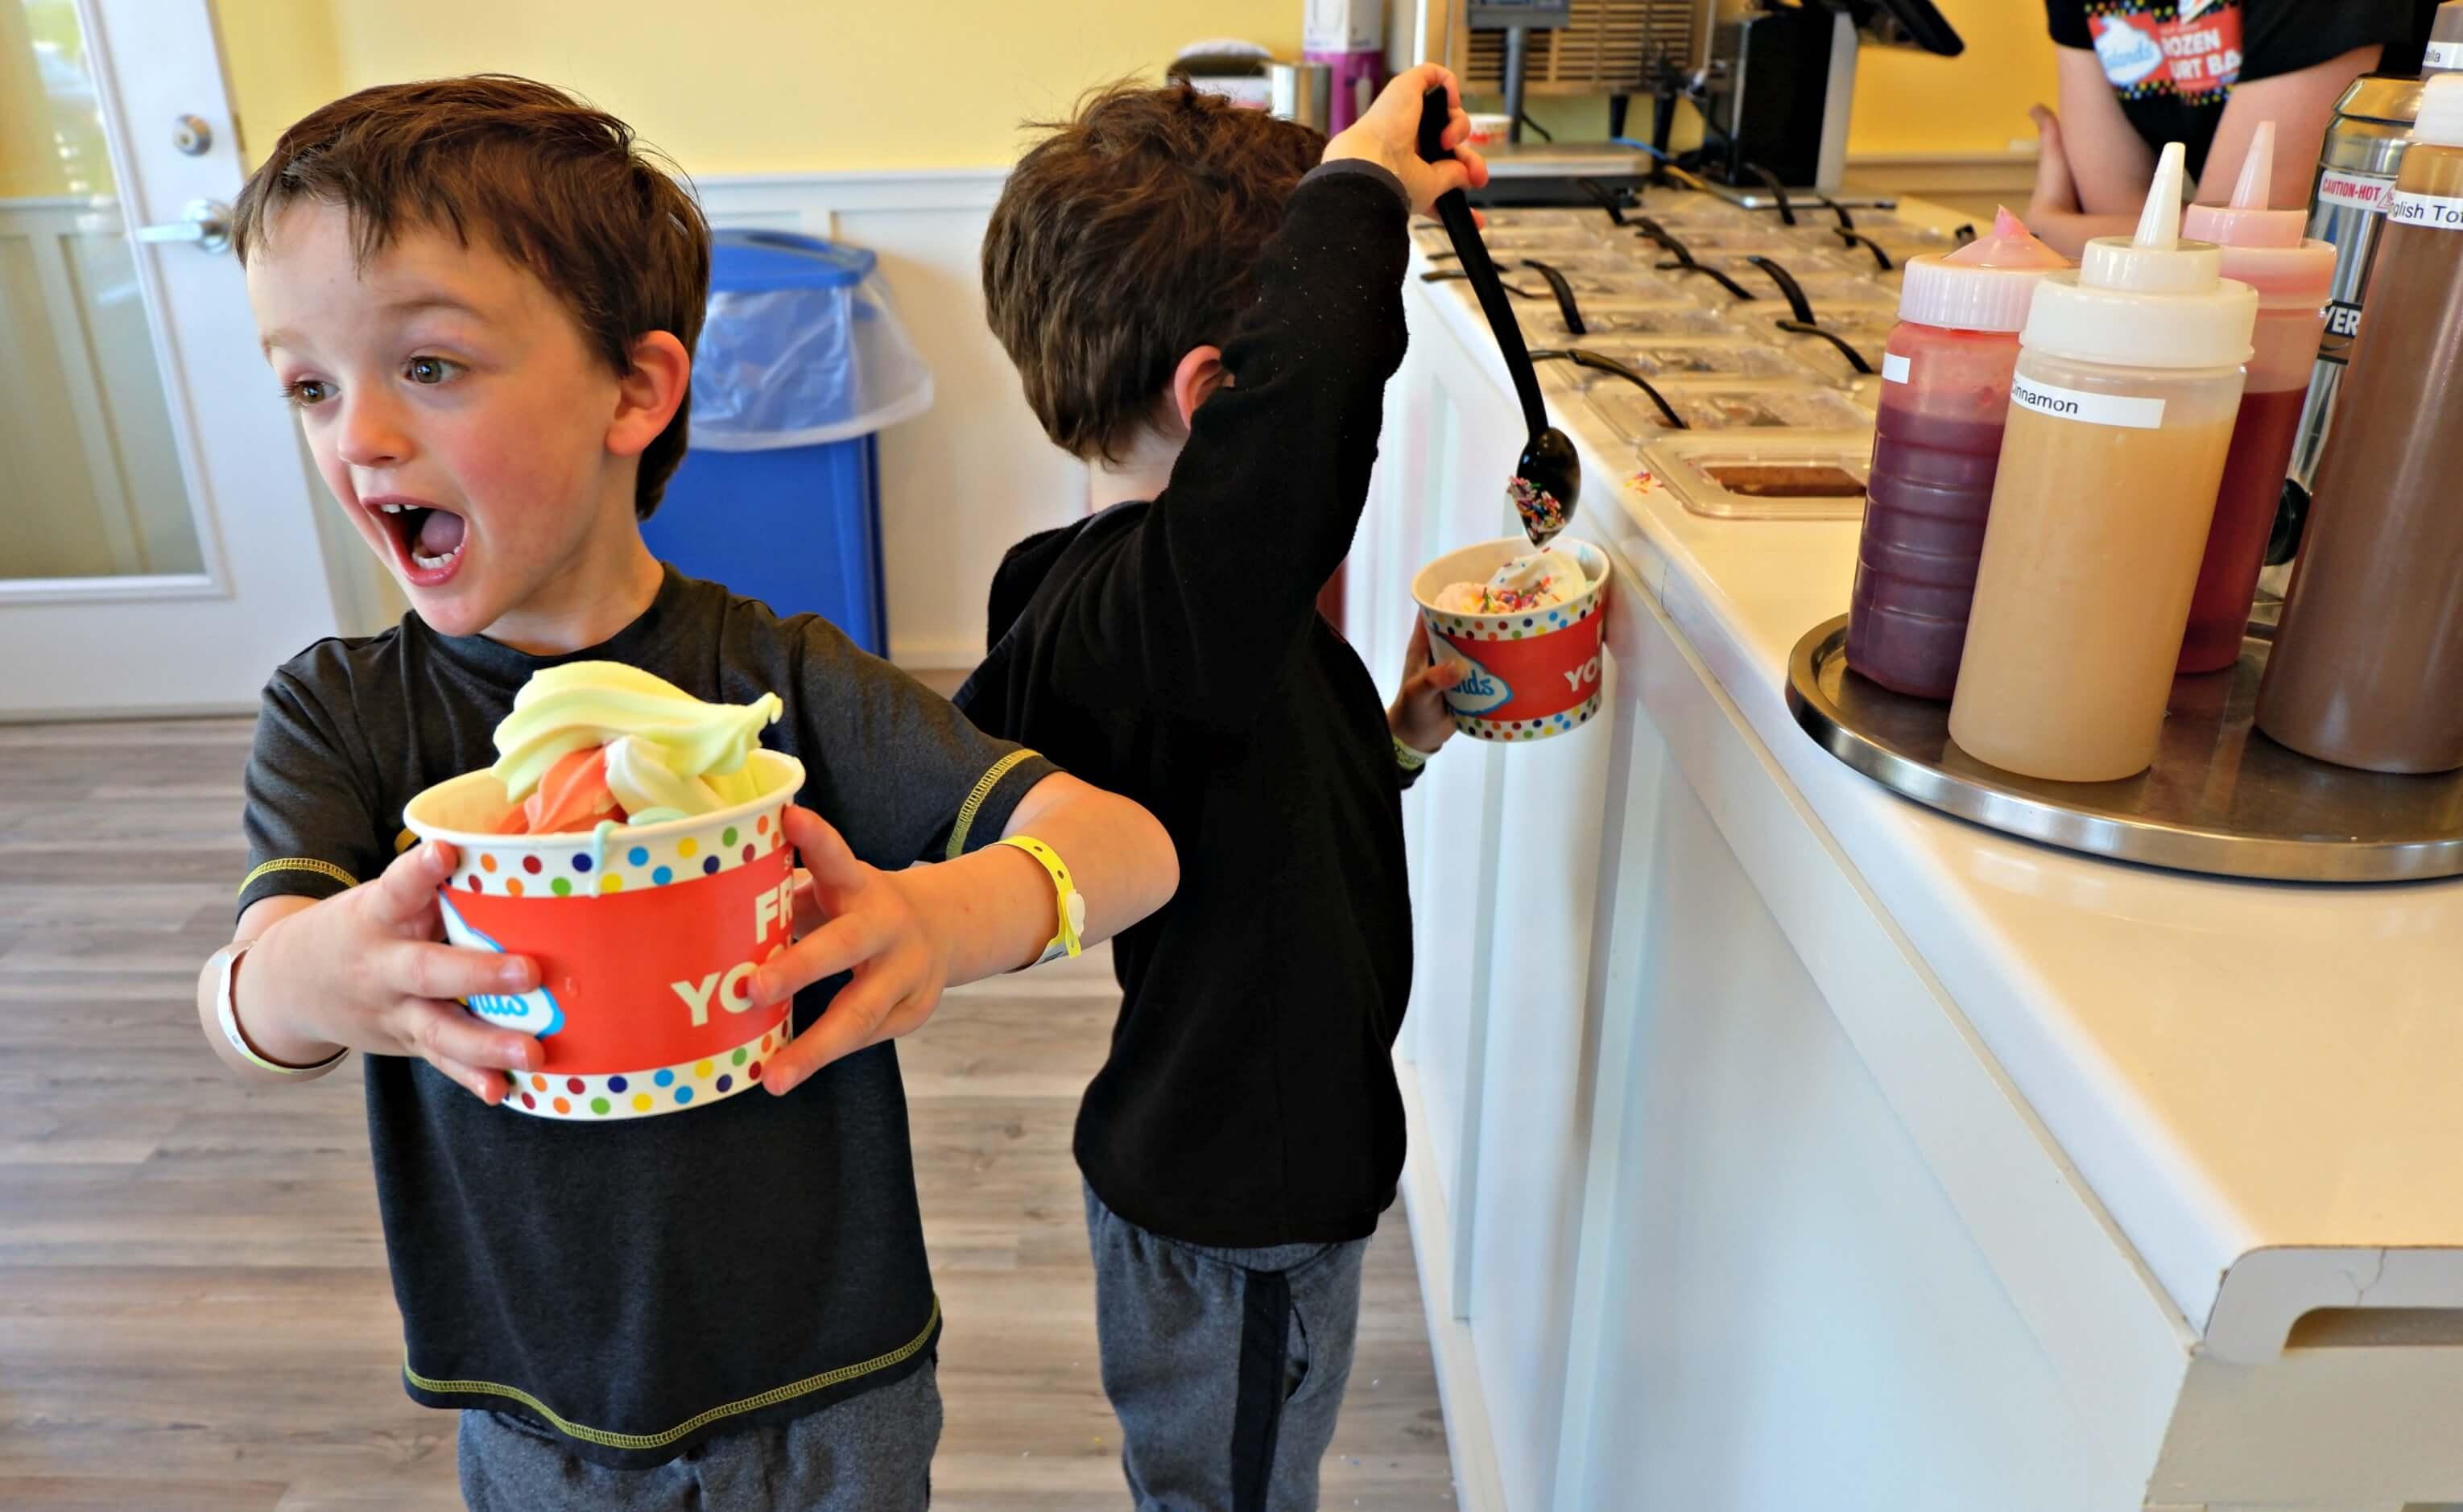 cavendish rainy day ideas pei frozen yogurt kids family things to do vacation pickle planet moncton